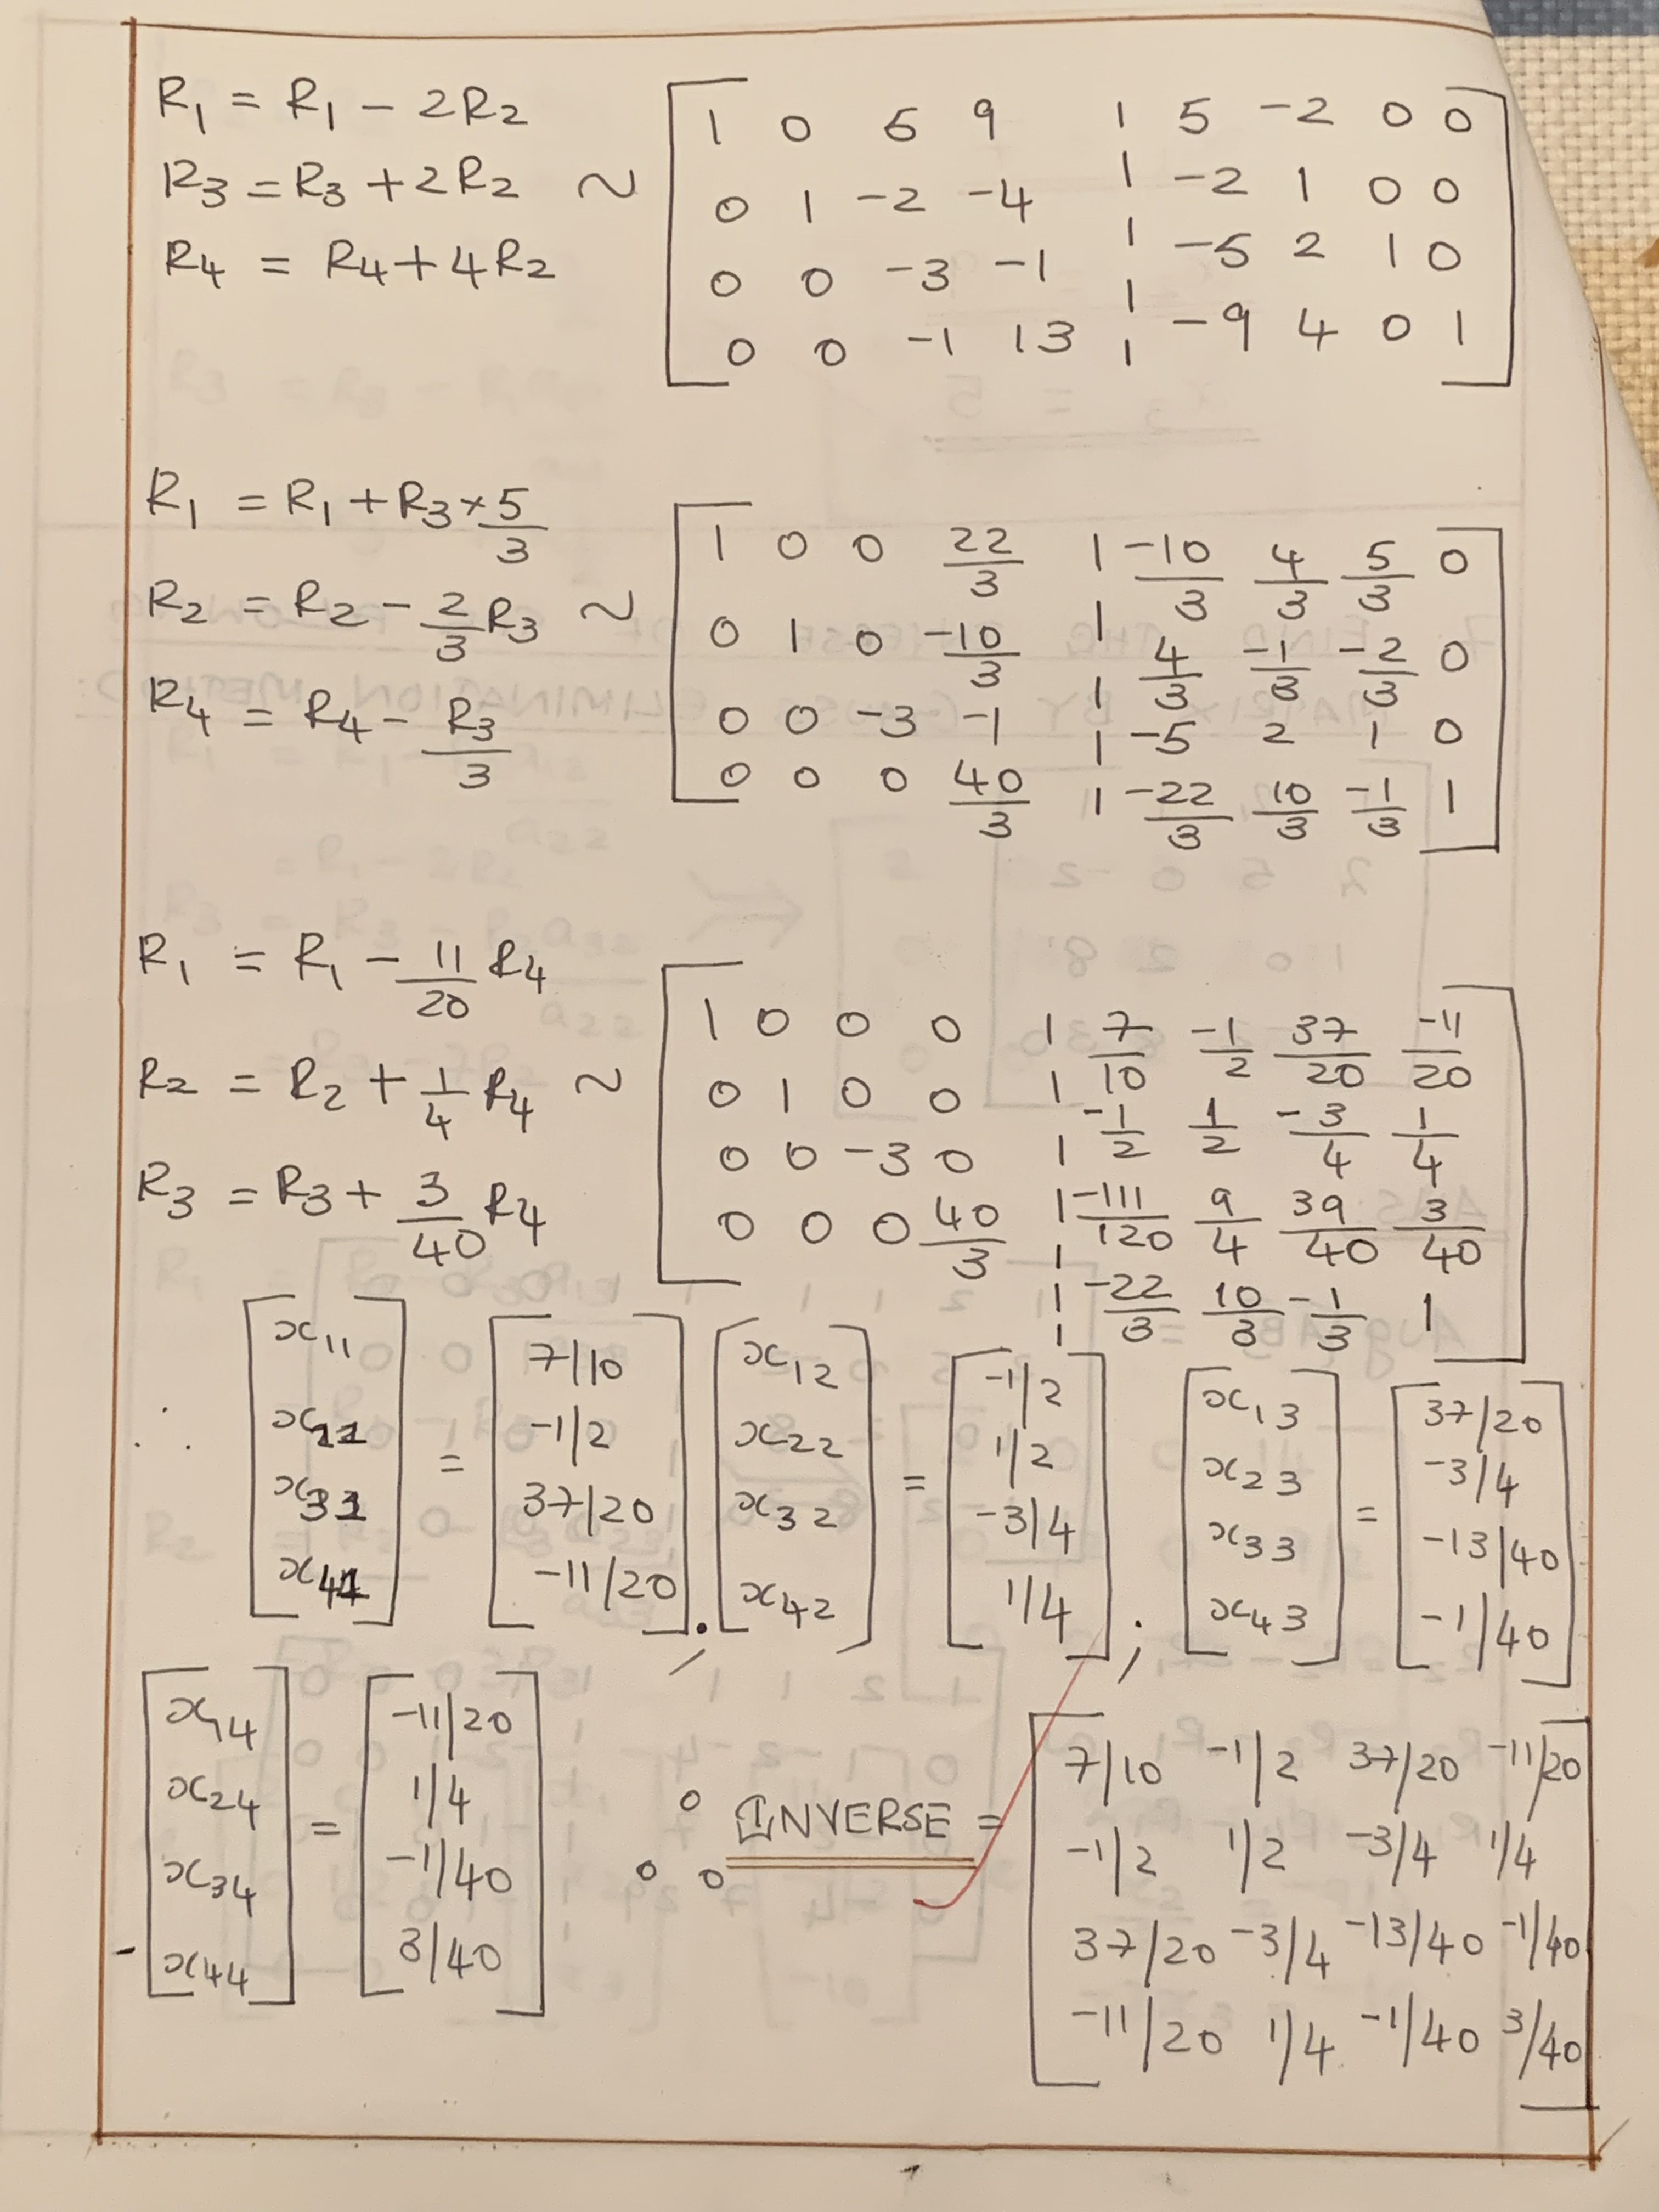 finding-inverse-matrix-gauss-elimination2